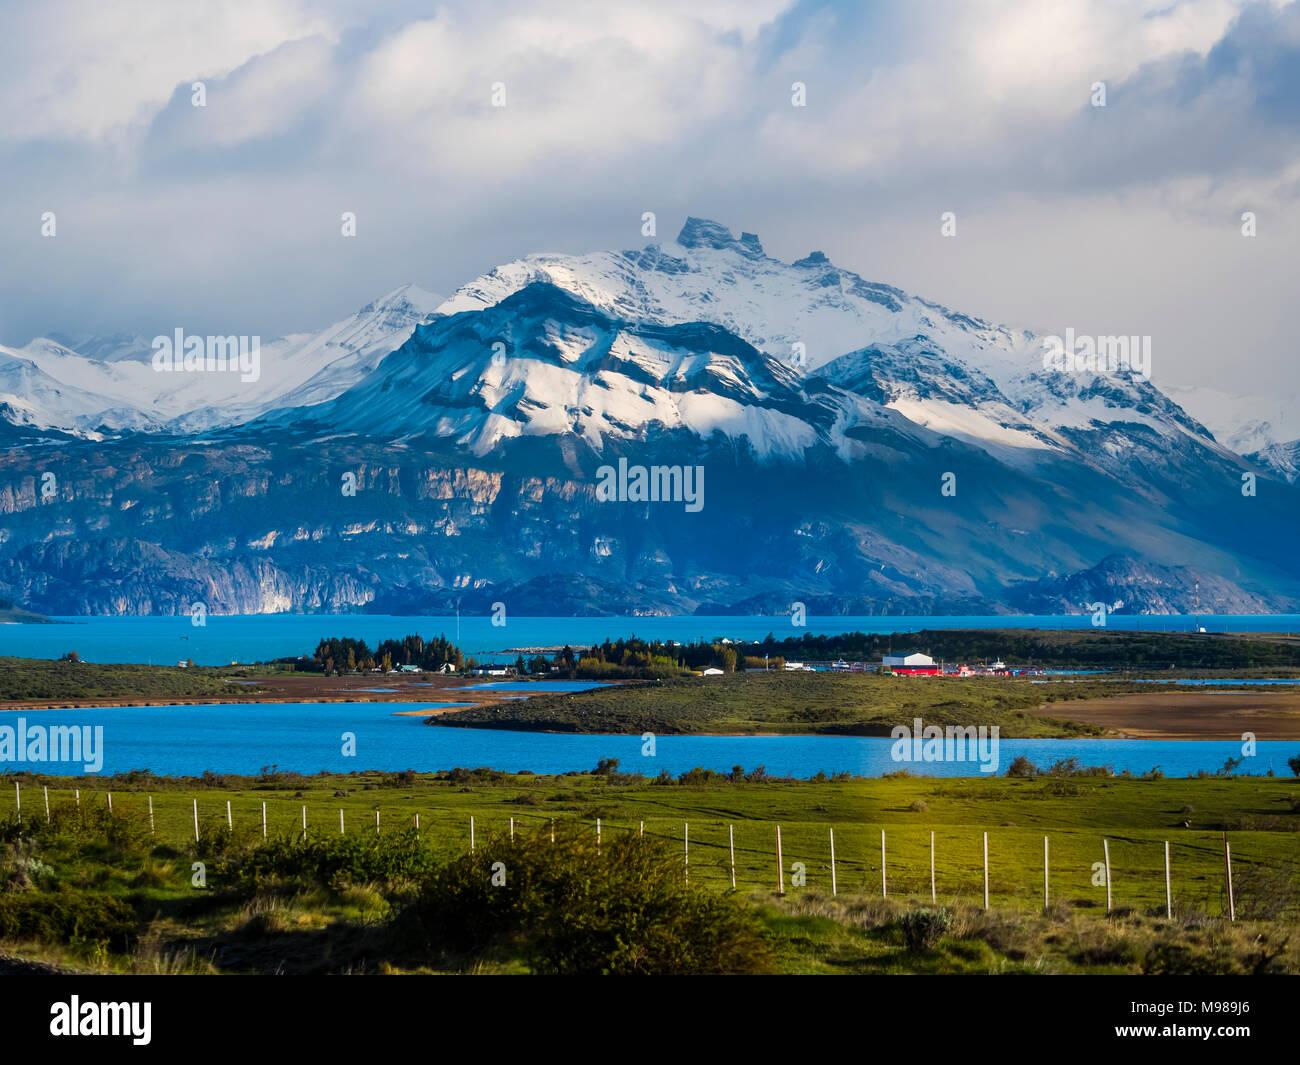 Argentina, Patagonia, El Calafate, Santa Cruz Provincia, Puerto Bandera, Lago Argentino Foto Stock